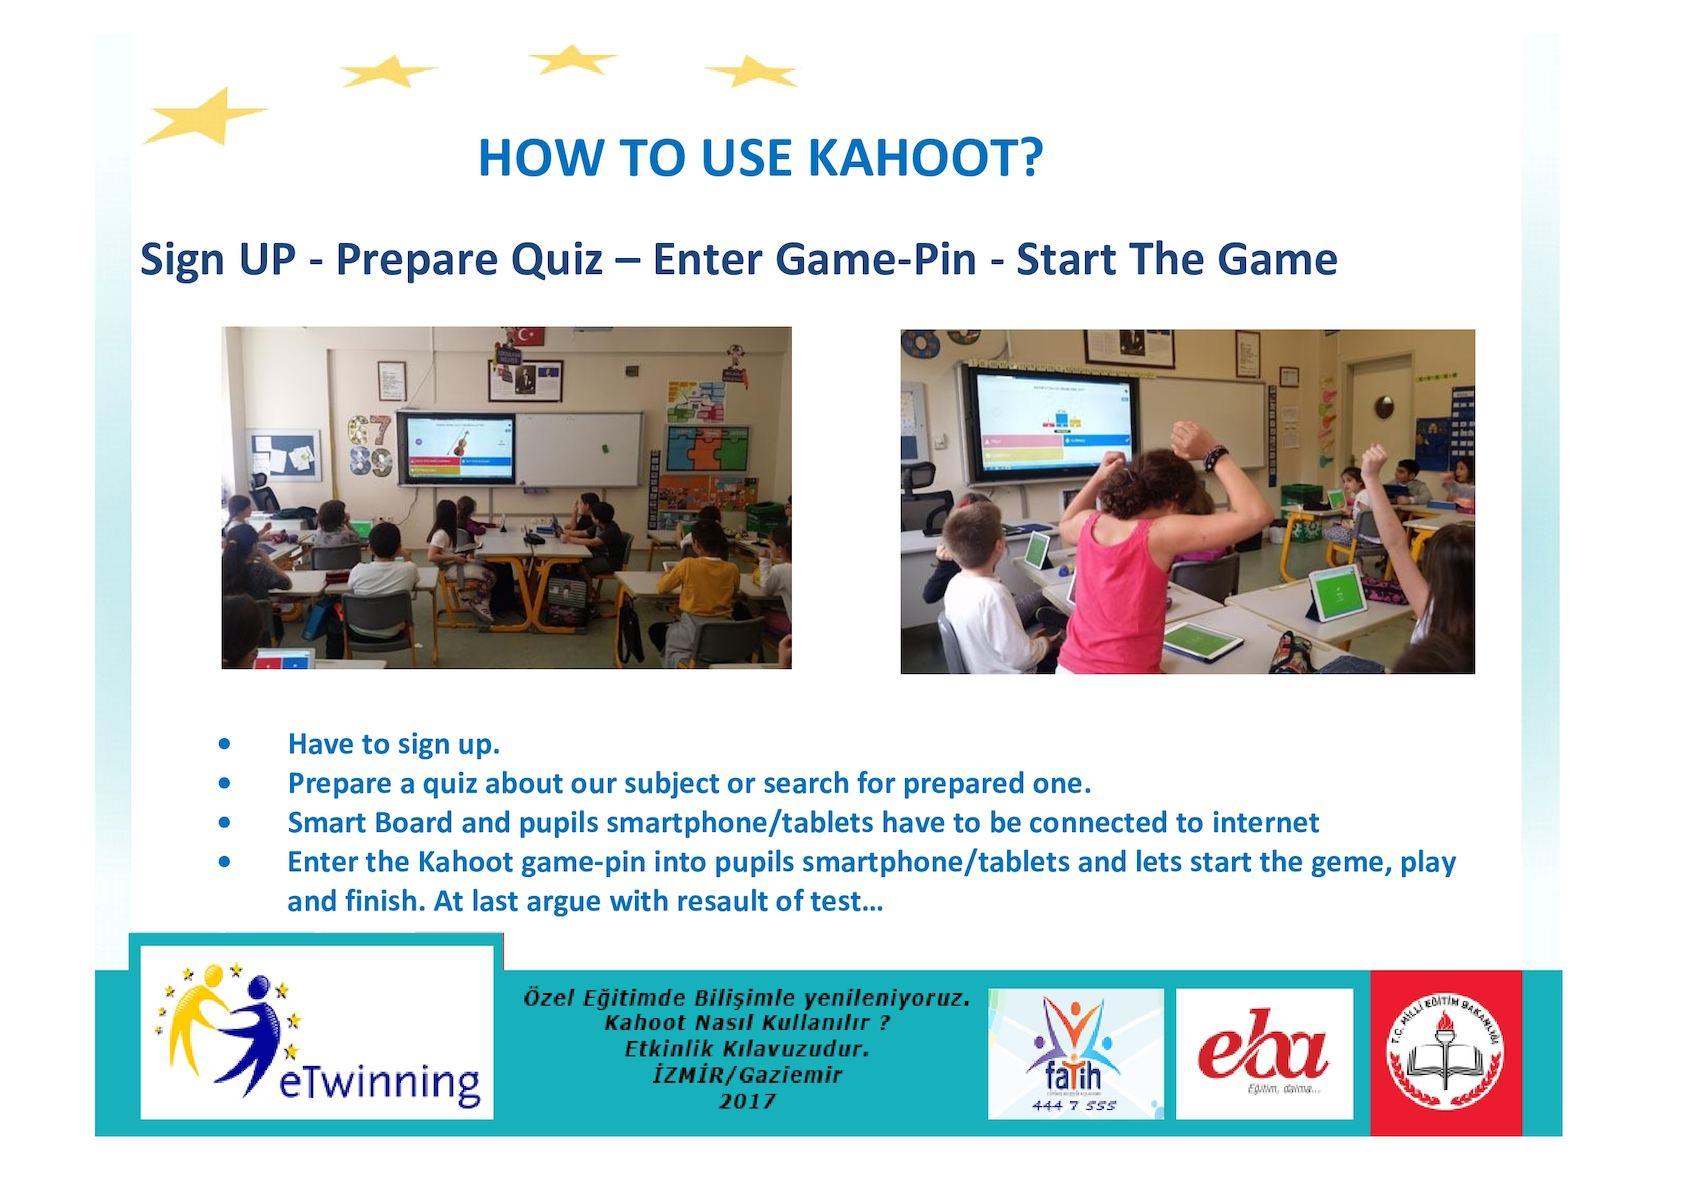 Calaméo - How To Use Kahoot Guide